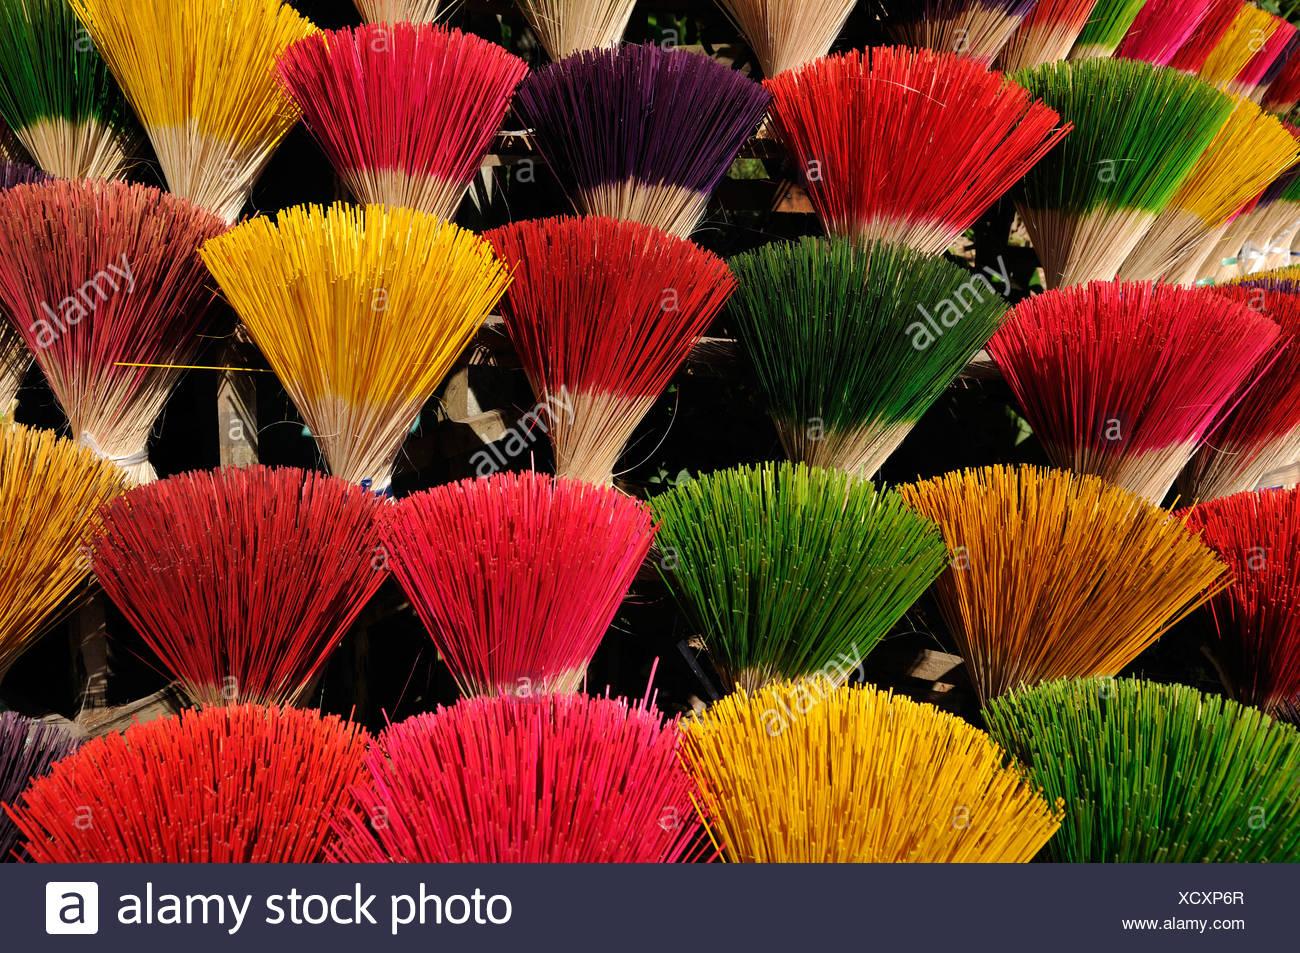 Colourful incense sticks, Hue, Vietnam, Asia - Stock Image